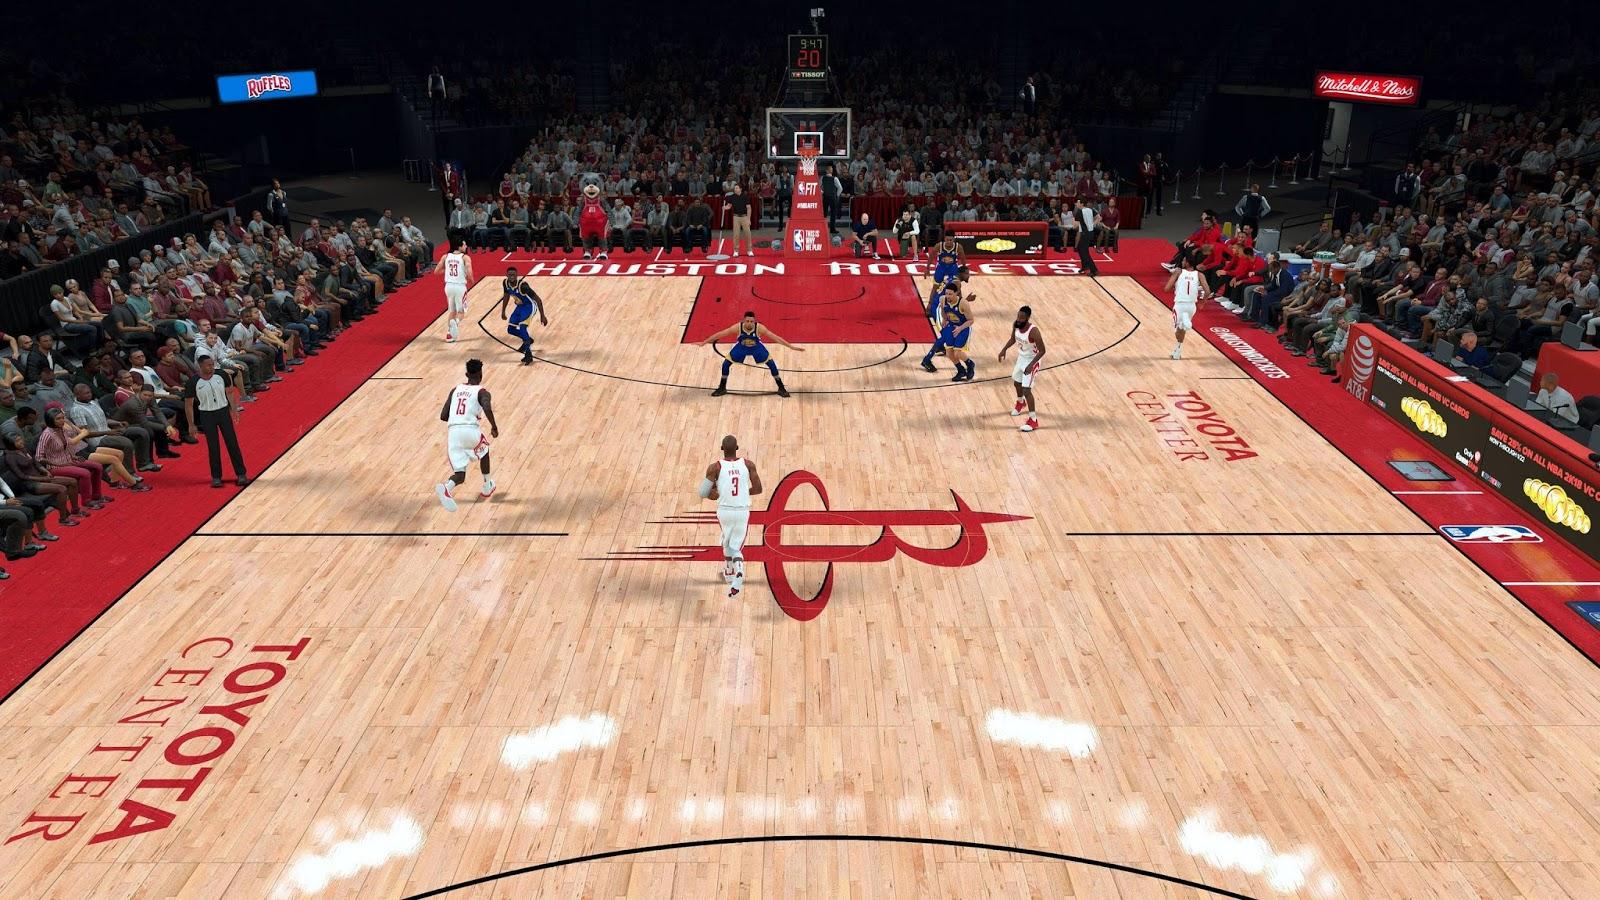 DNA Of Basketball | DNAOBB: NBA 2K18 Houston Rockets Toyota Center by mrk326 RELEASED